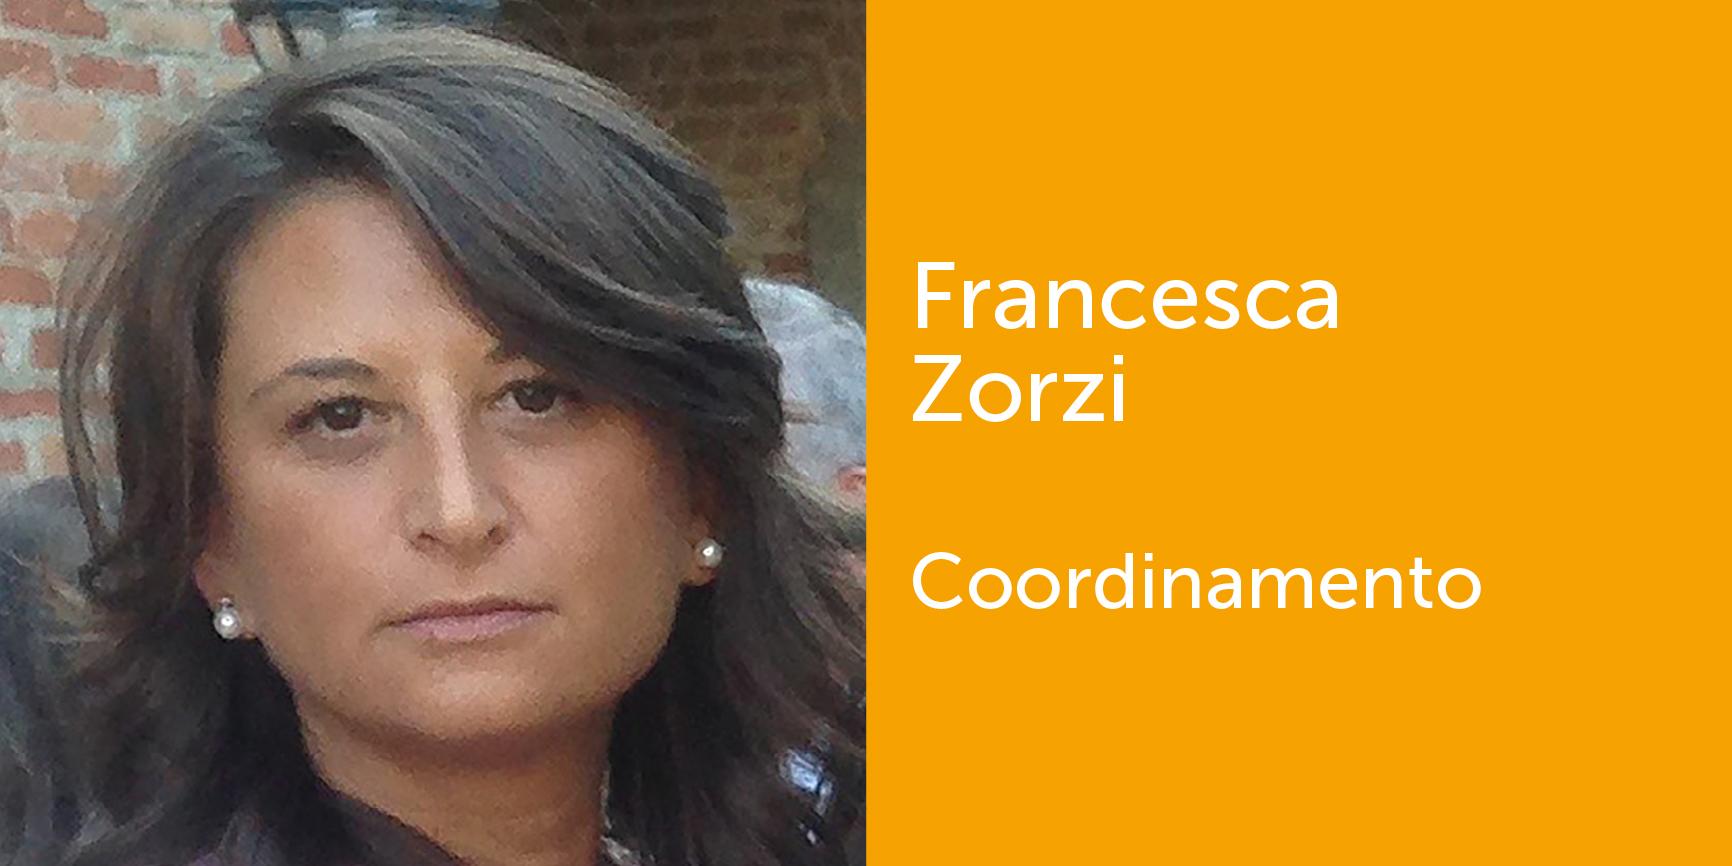 Francesca Zorzi - Coordinamento